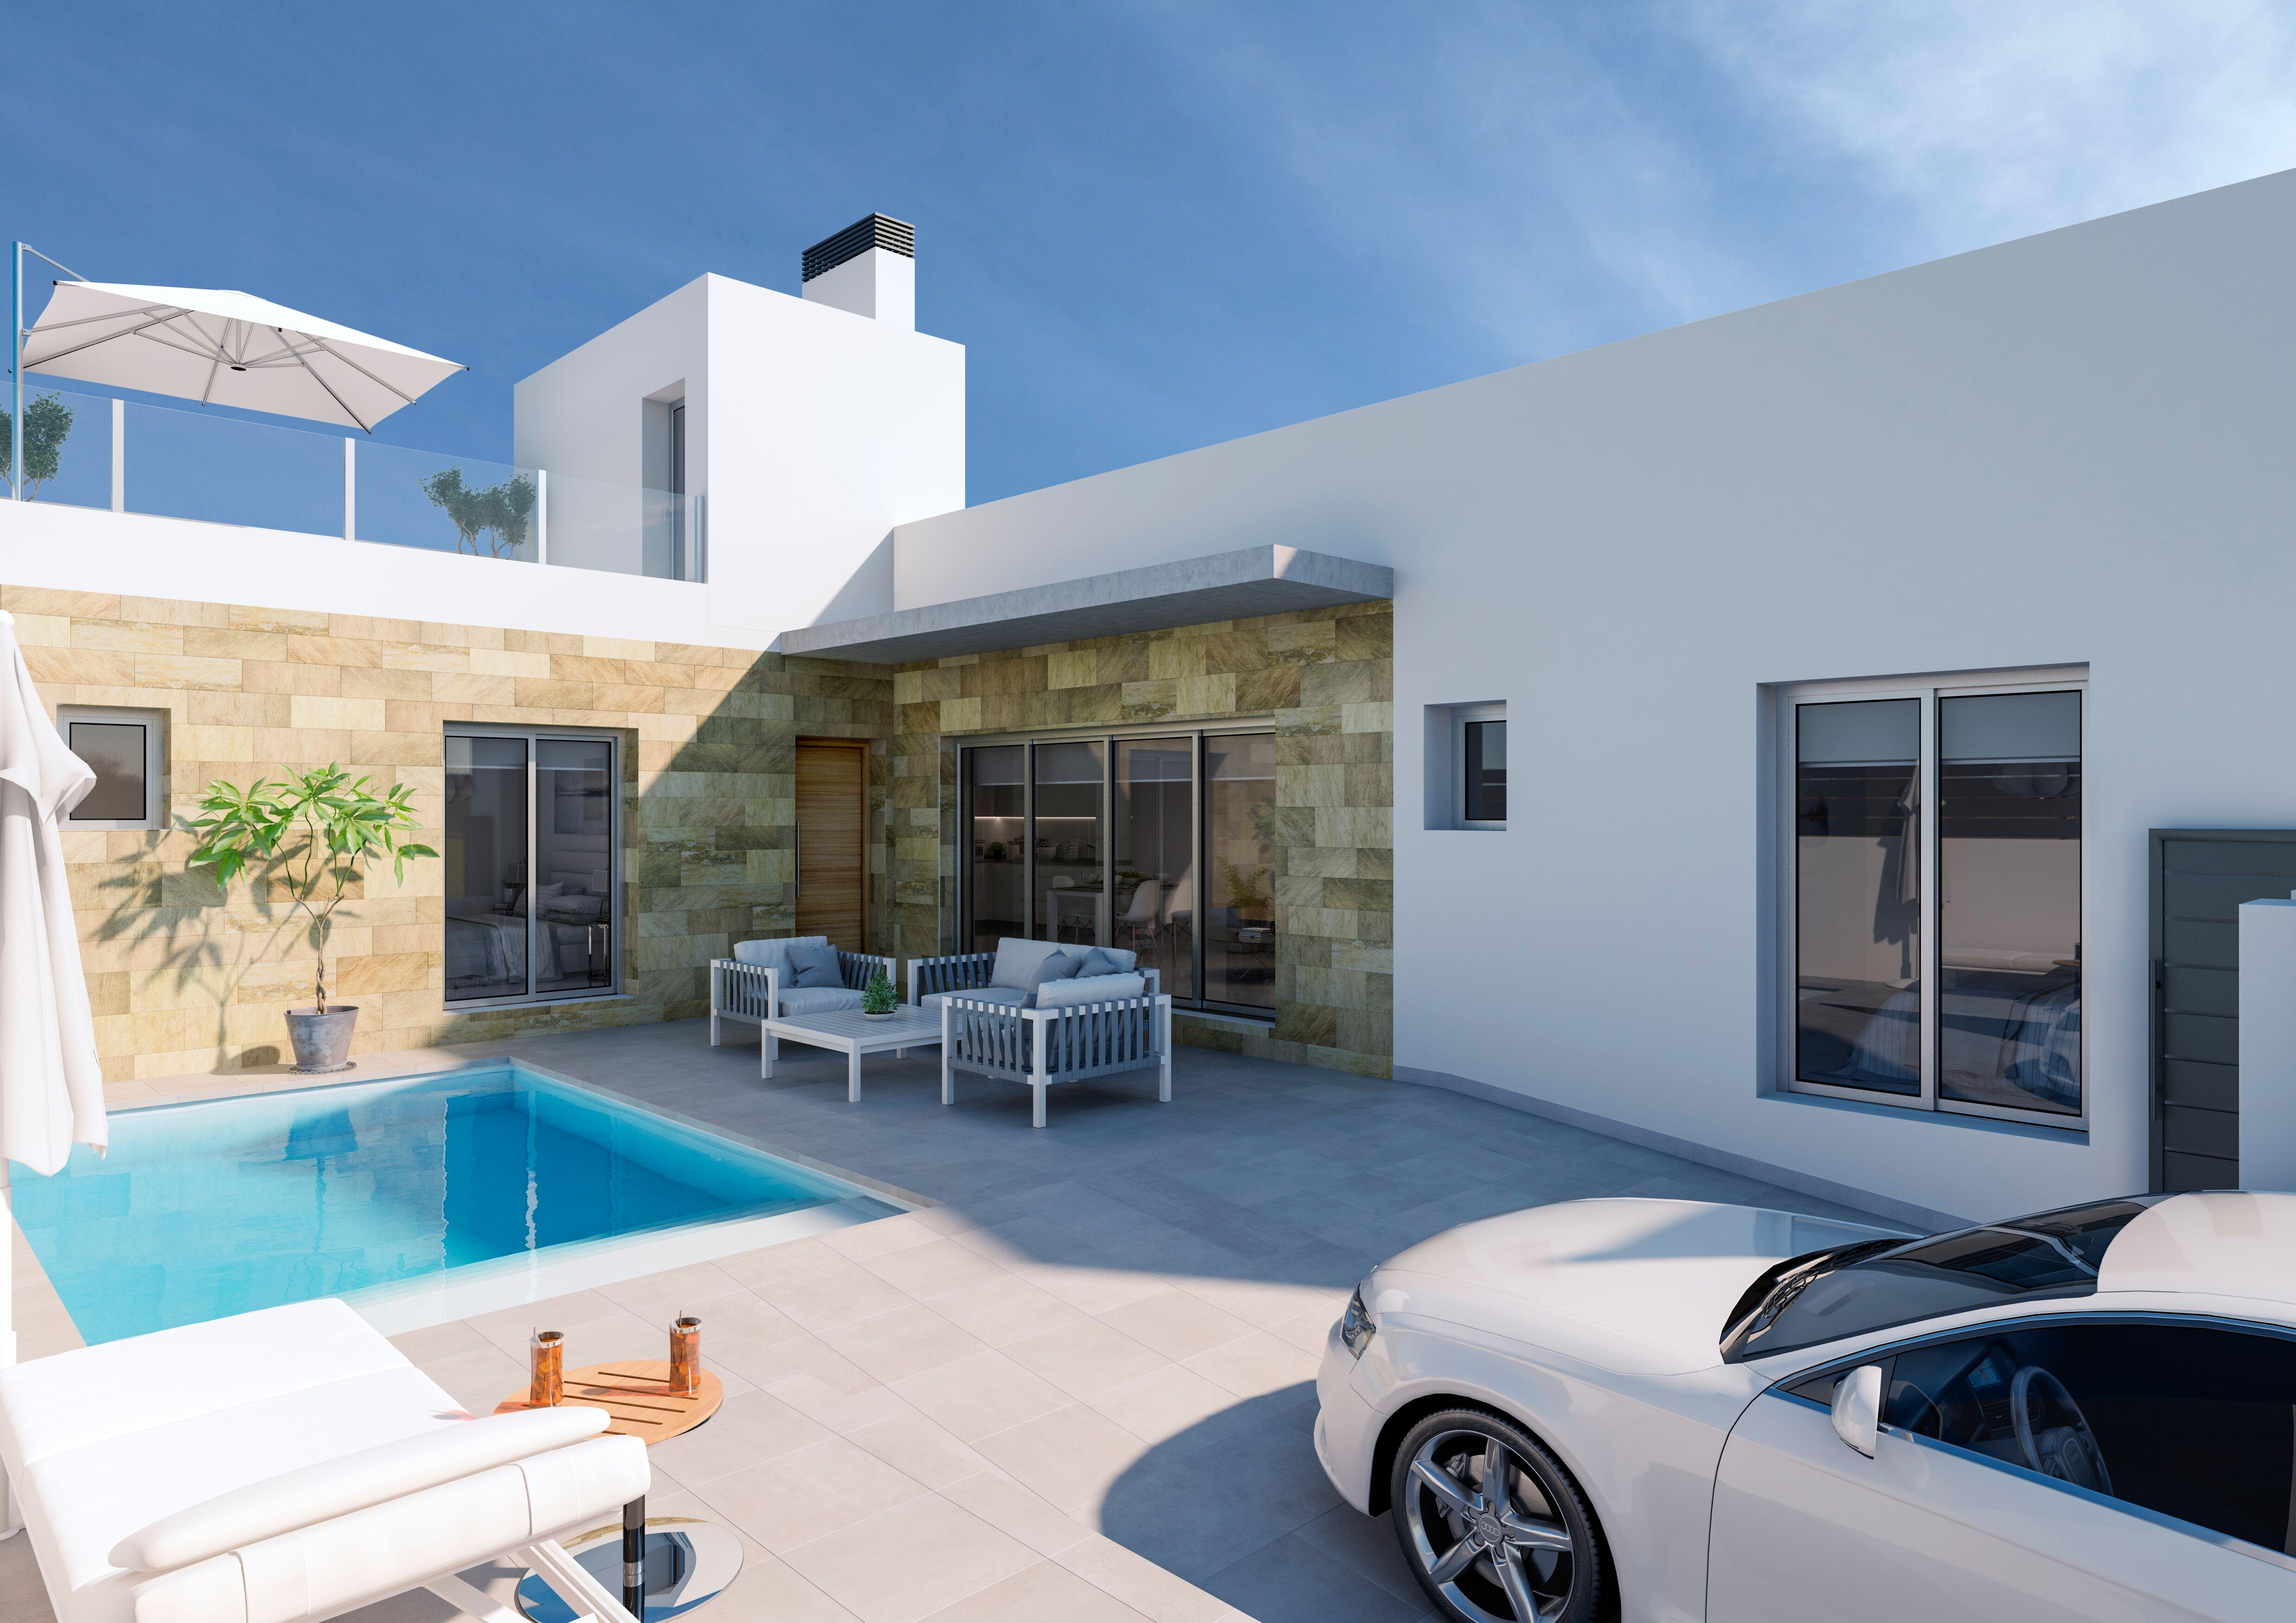 Moderne luxe villa 39 s nabij guardamar costa blanca zuid for Moderne luxe villa